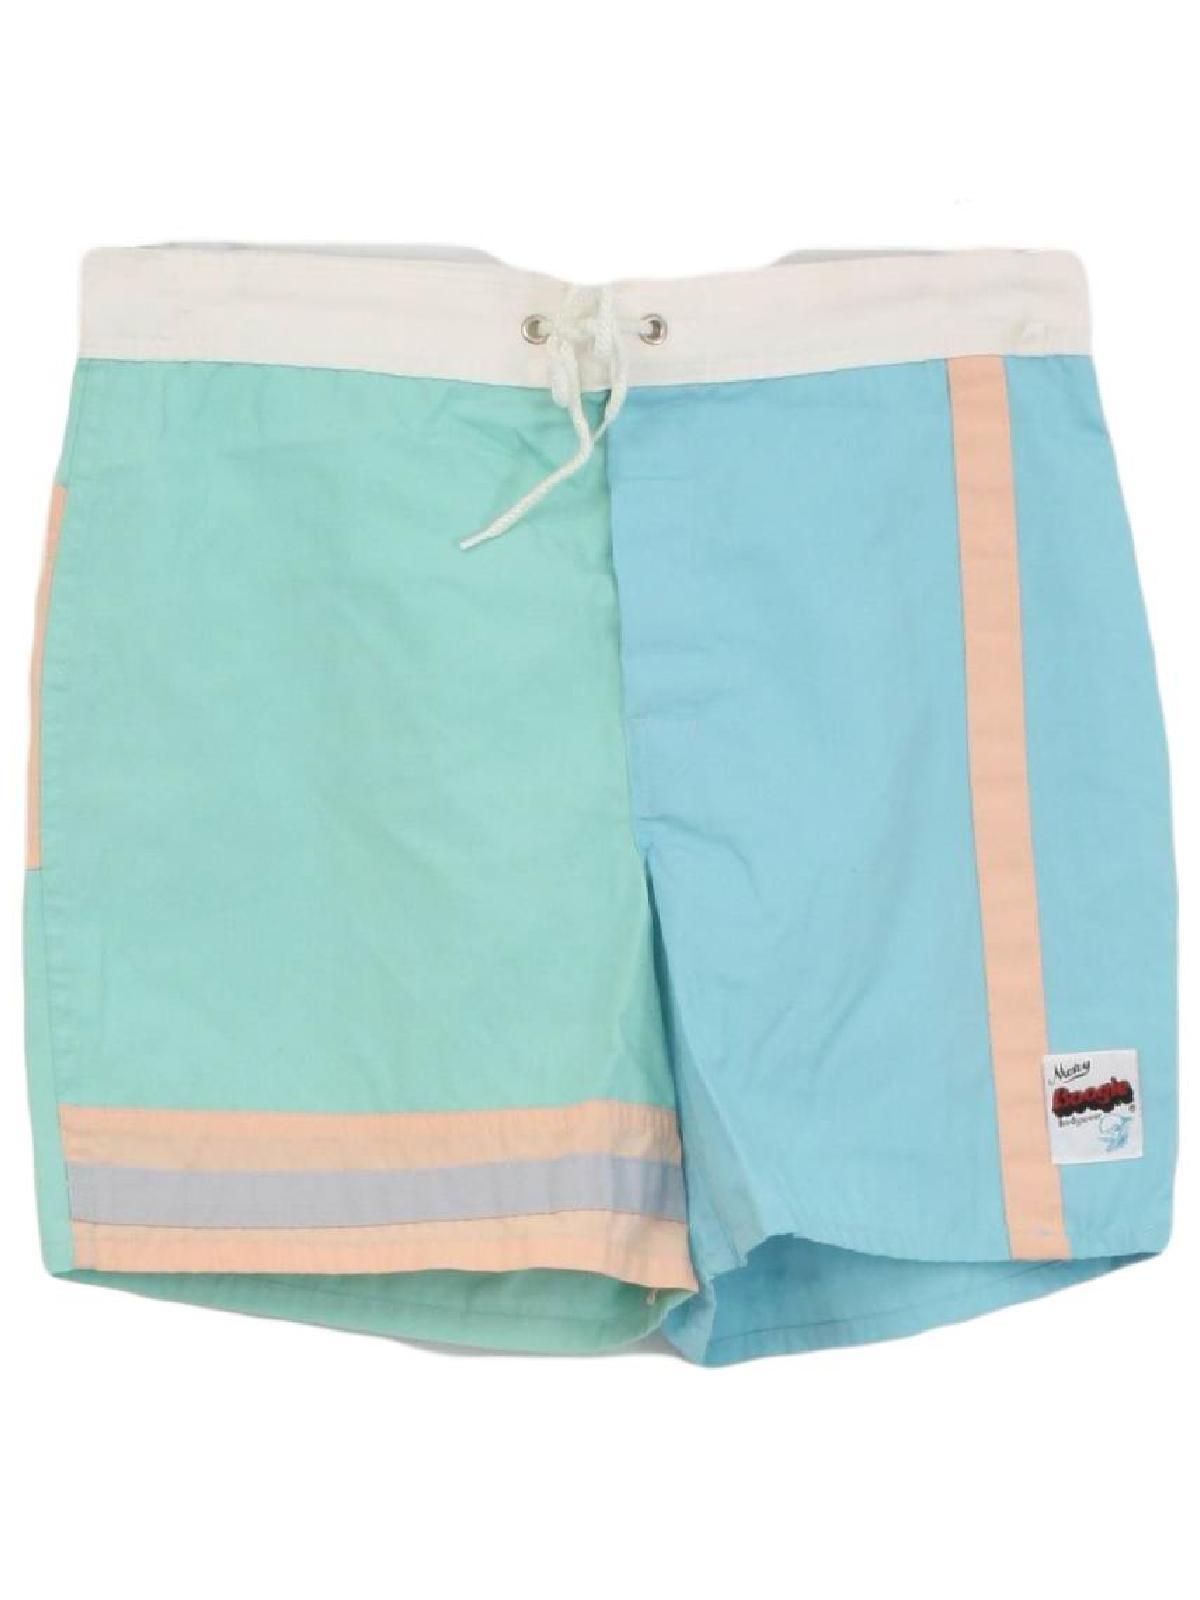 Boogie Bodywear Nineties Vintage Shorts: early 90s -Boogie ...